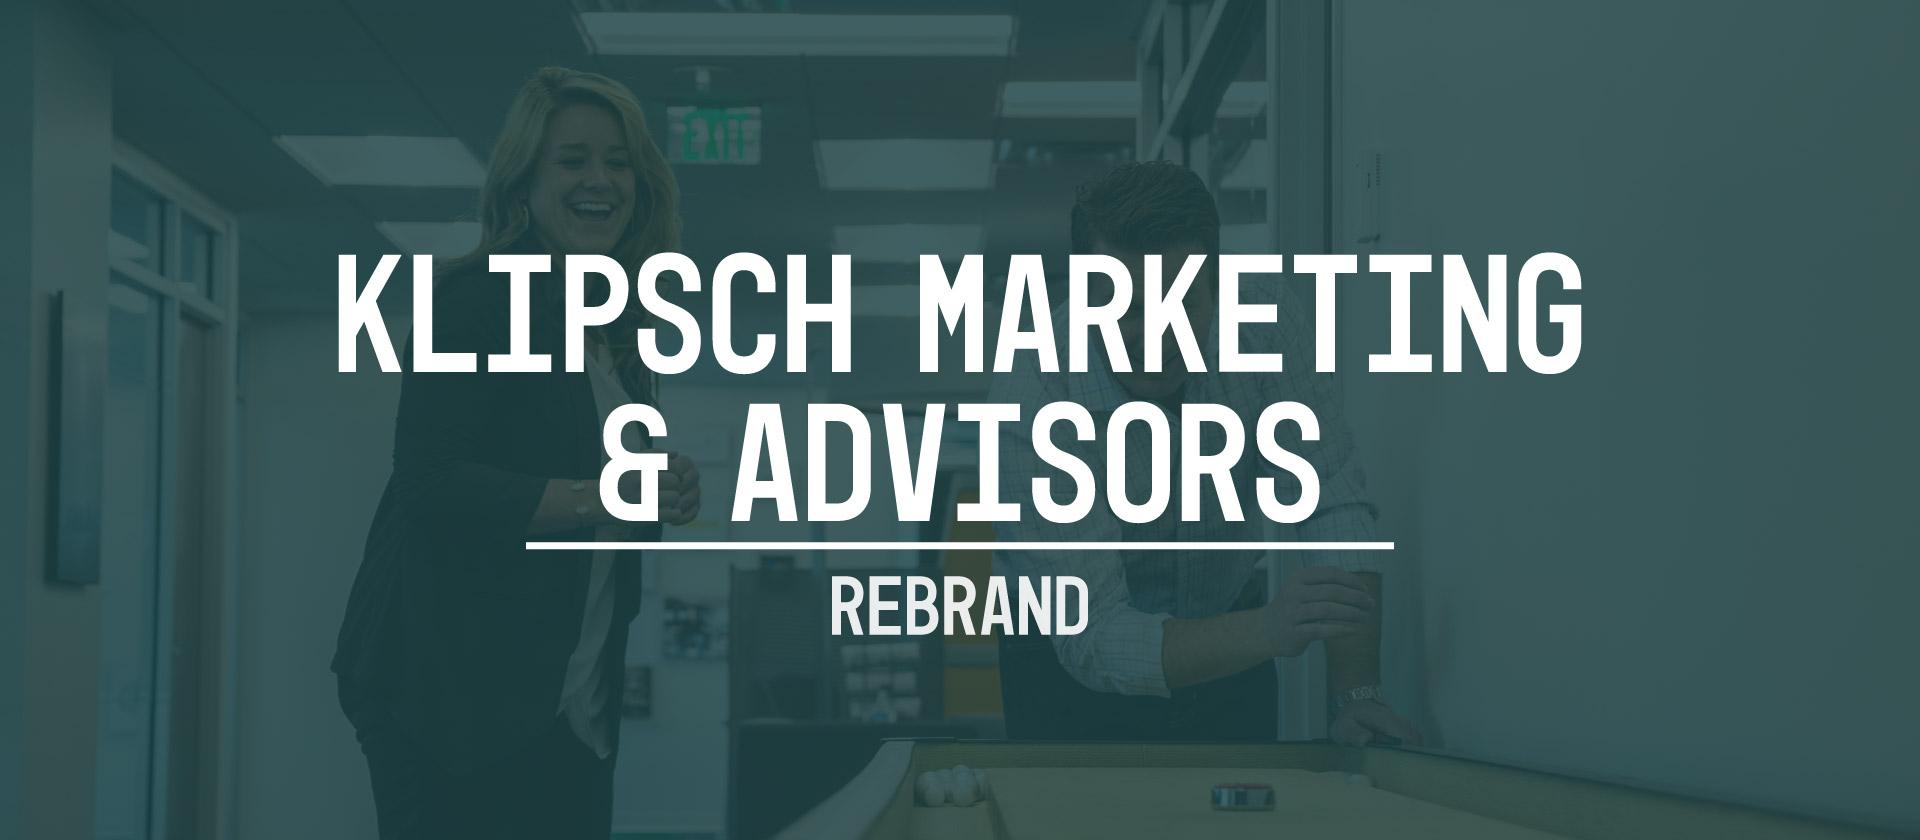 KMA rebrand web Header Klipsch Marketing & Advisors